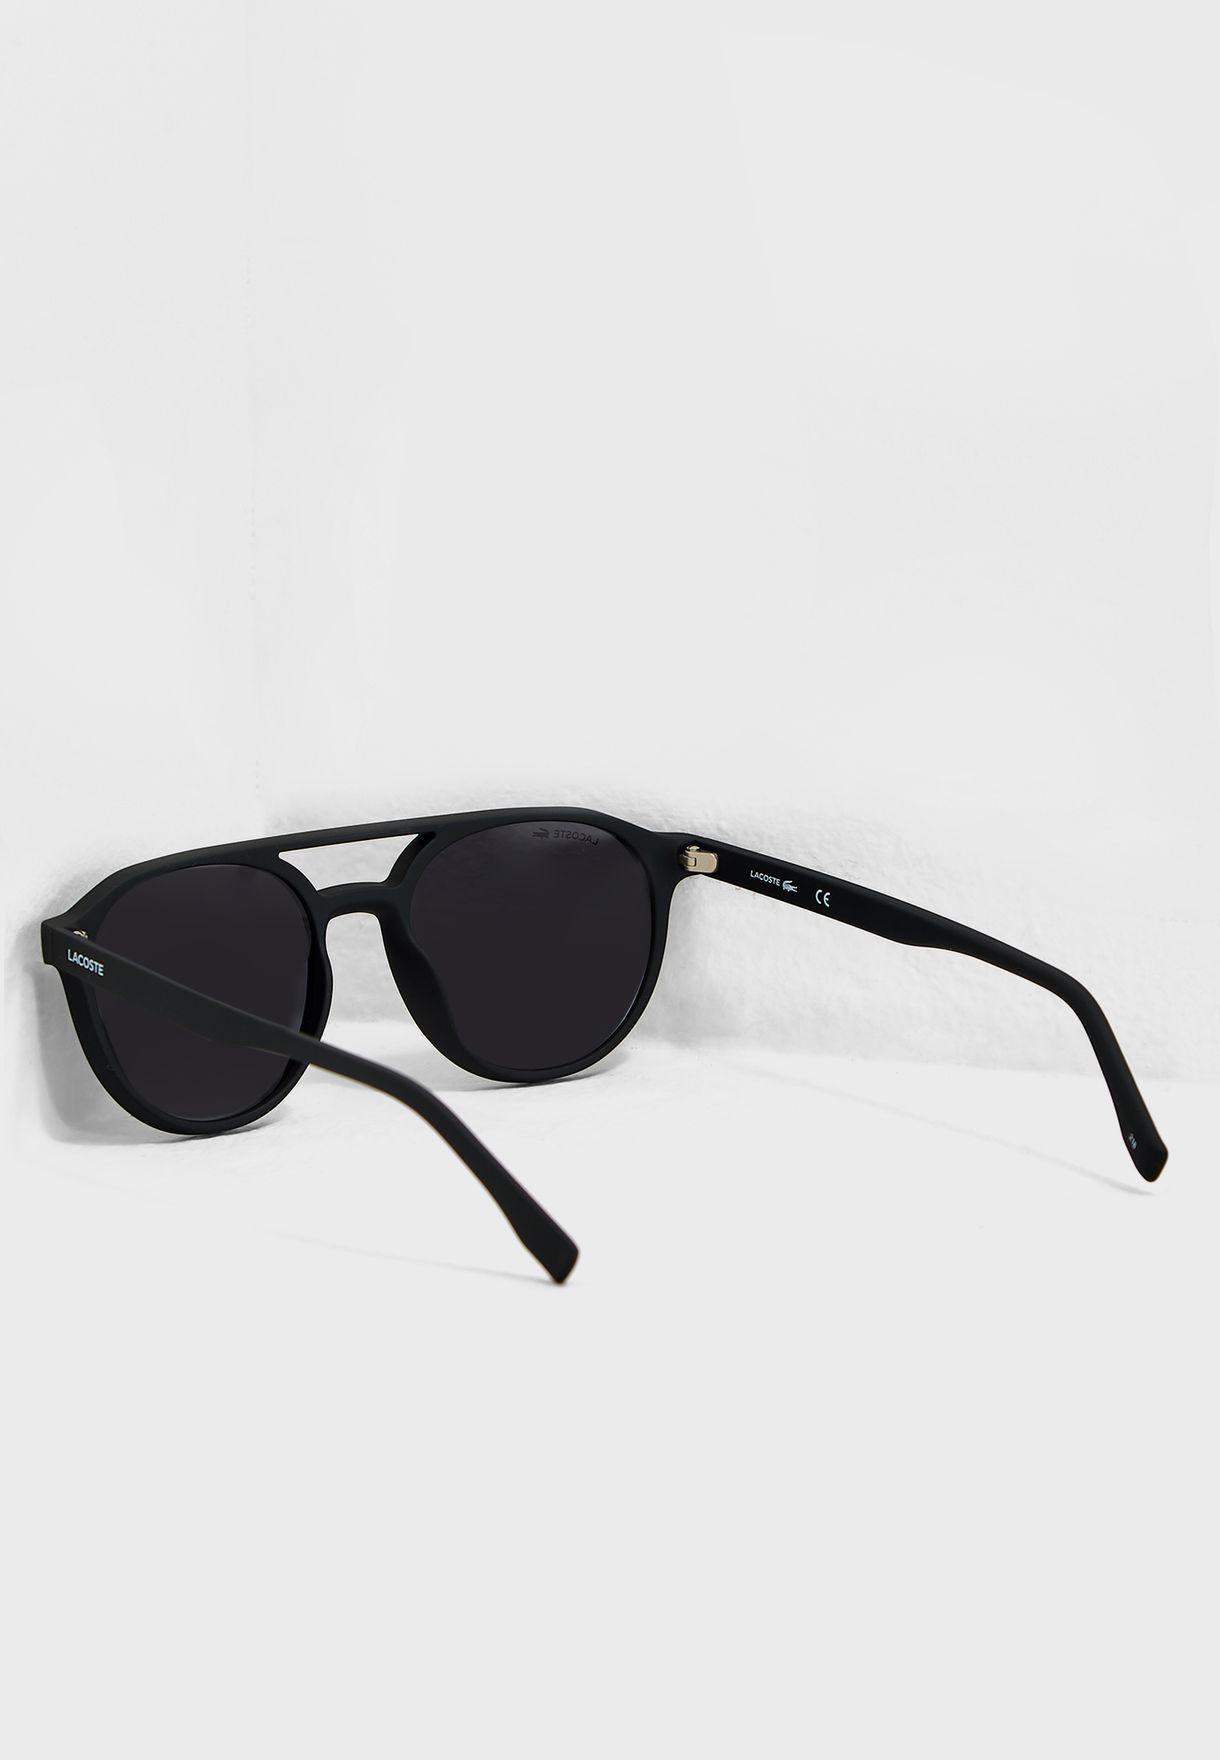 6df18b5cdc53 Shop Lacoste black Round Sunglasses L881S-001 for Men in UAE ...